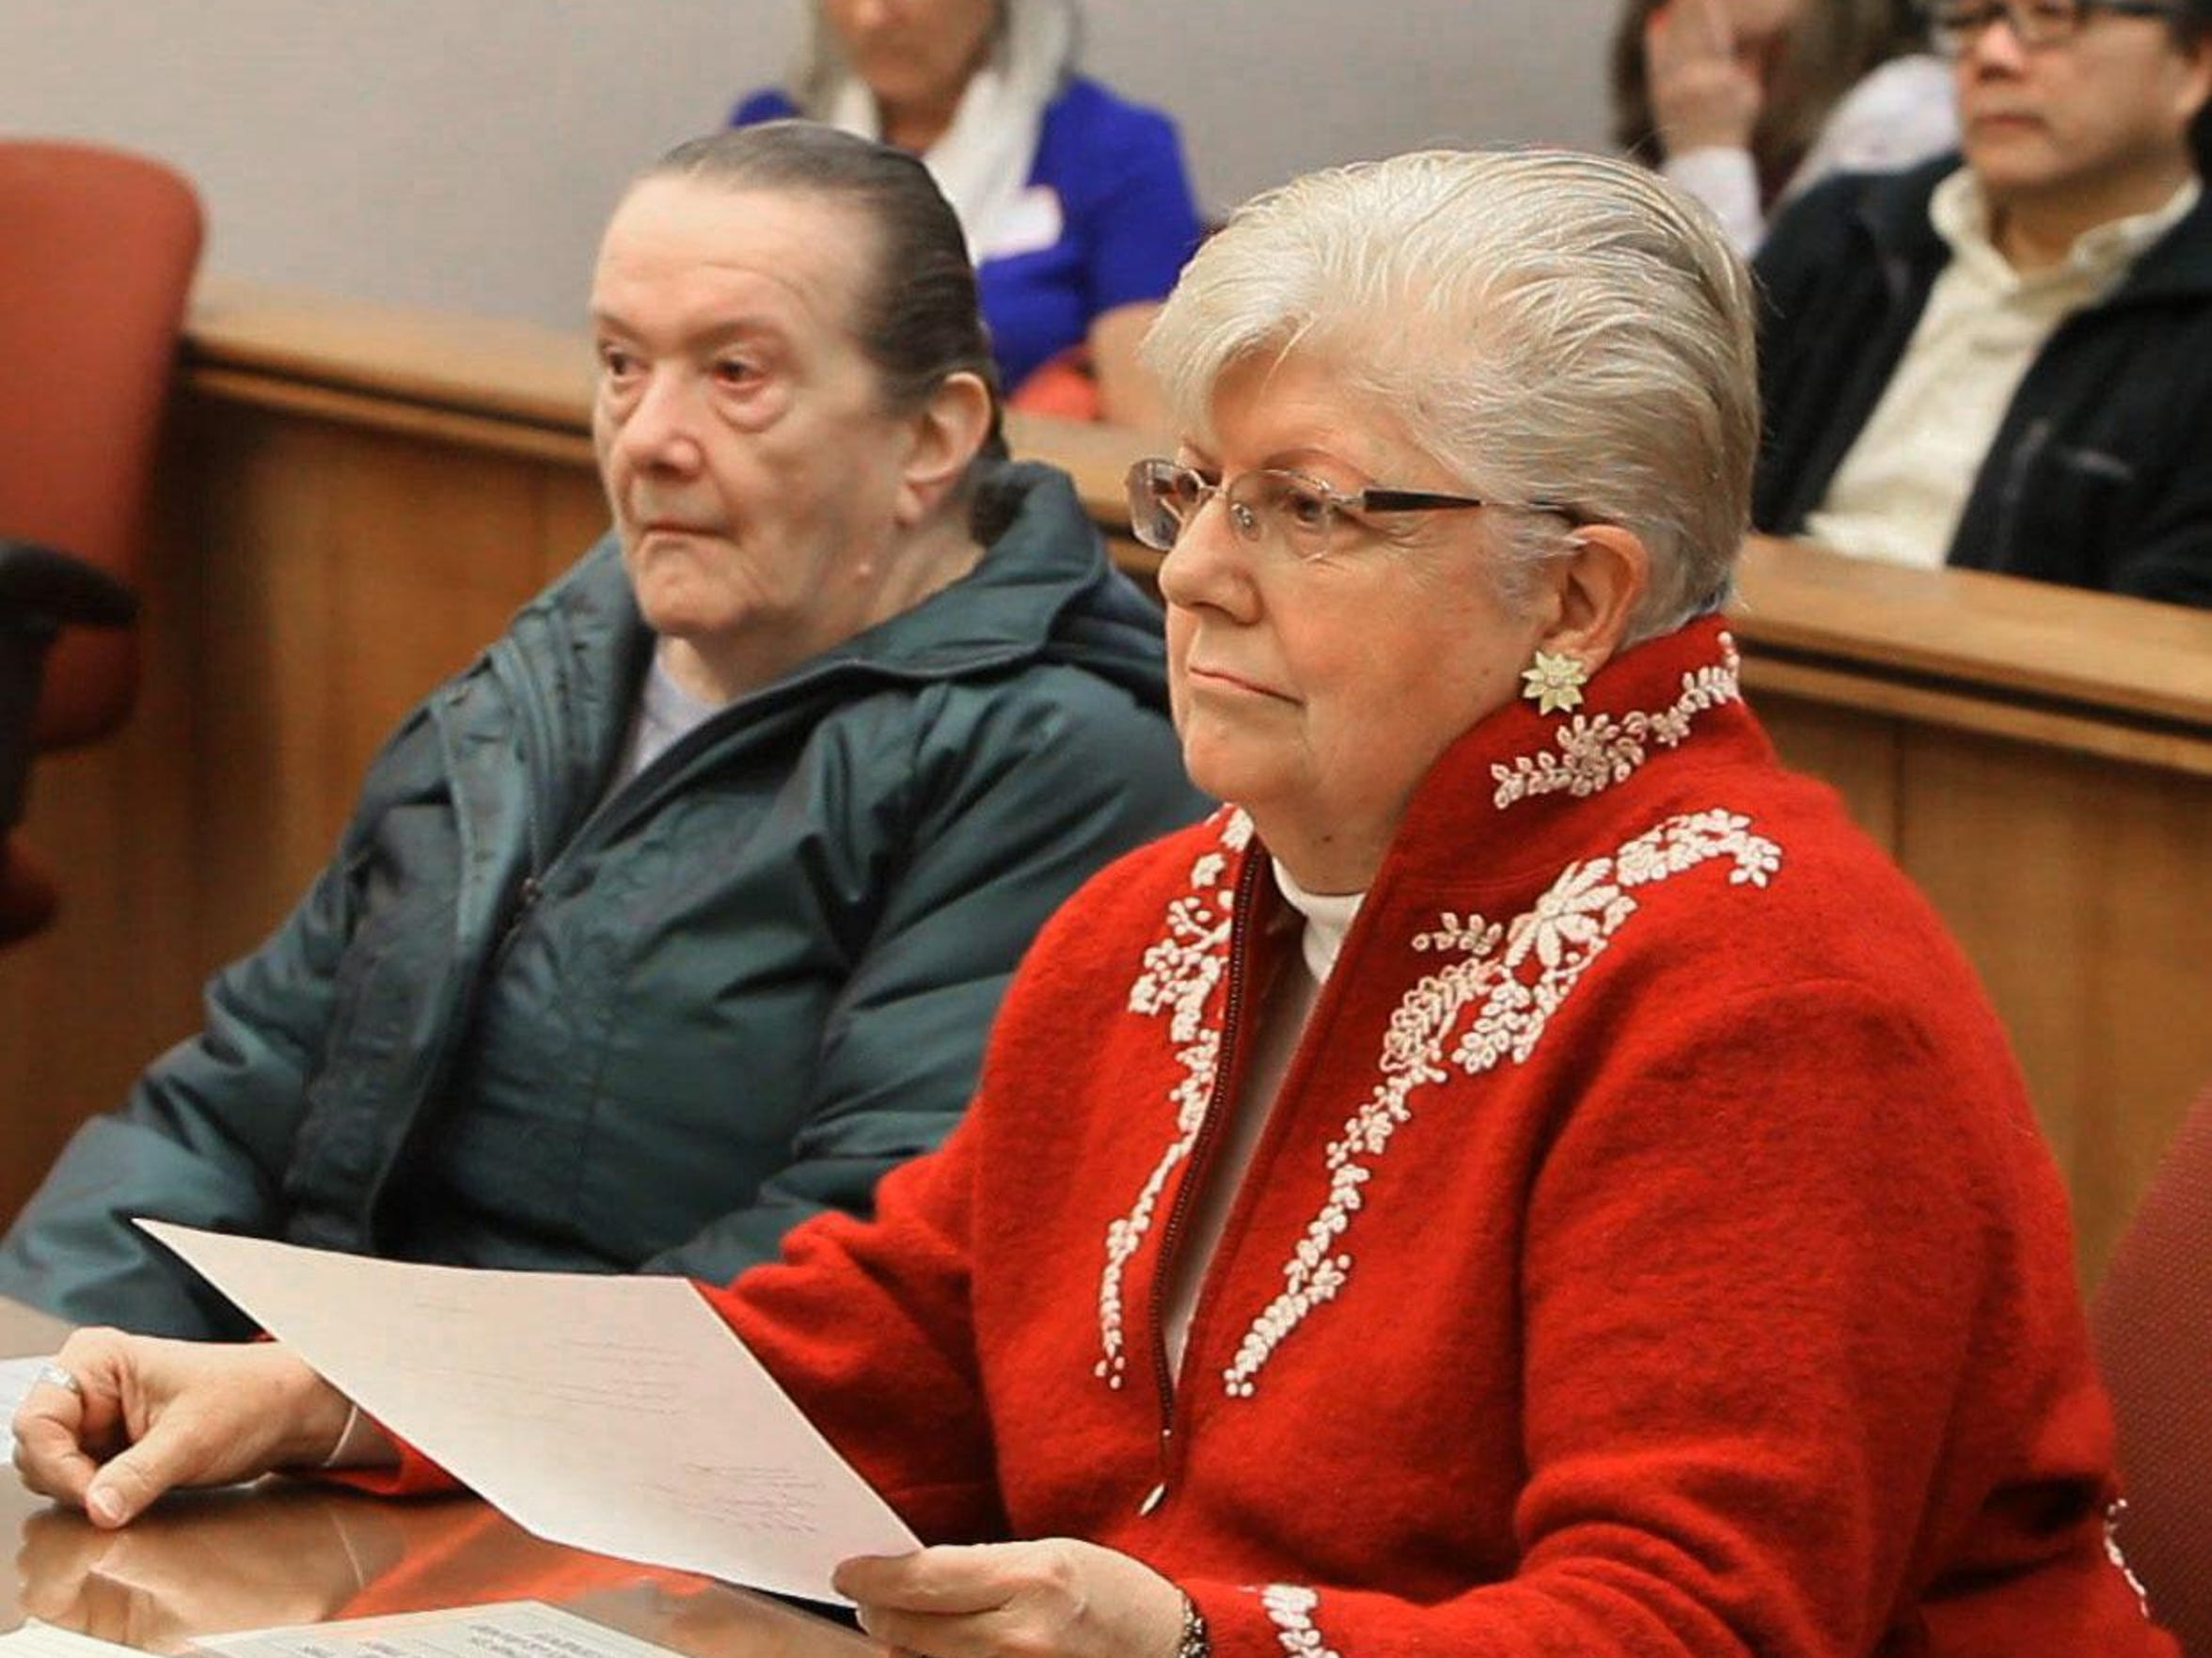 Helen Hugo, left, in the Atlantic County courthouse